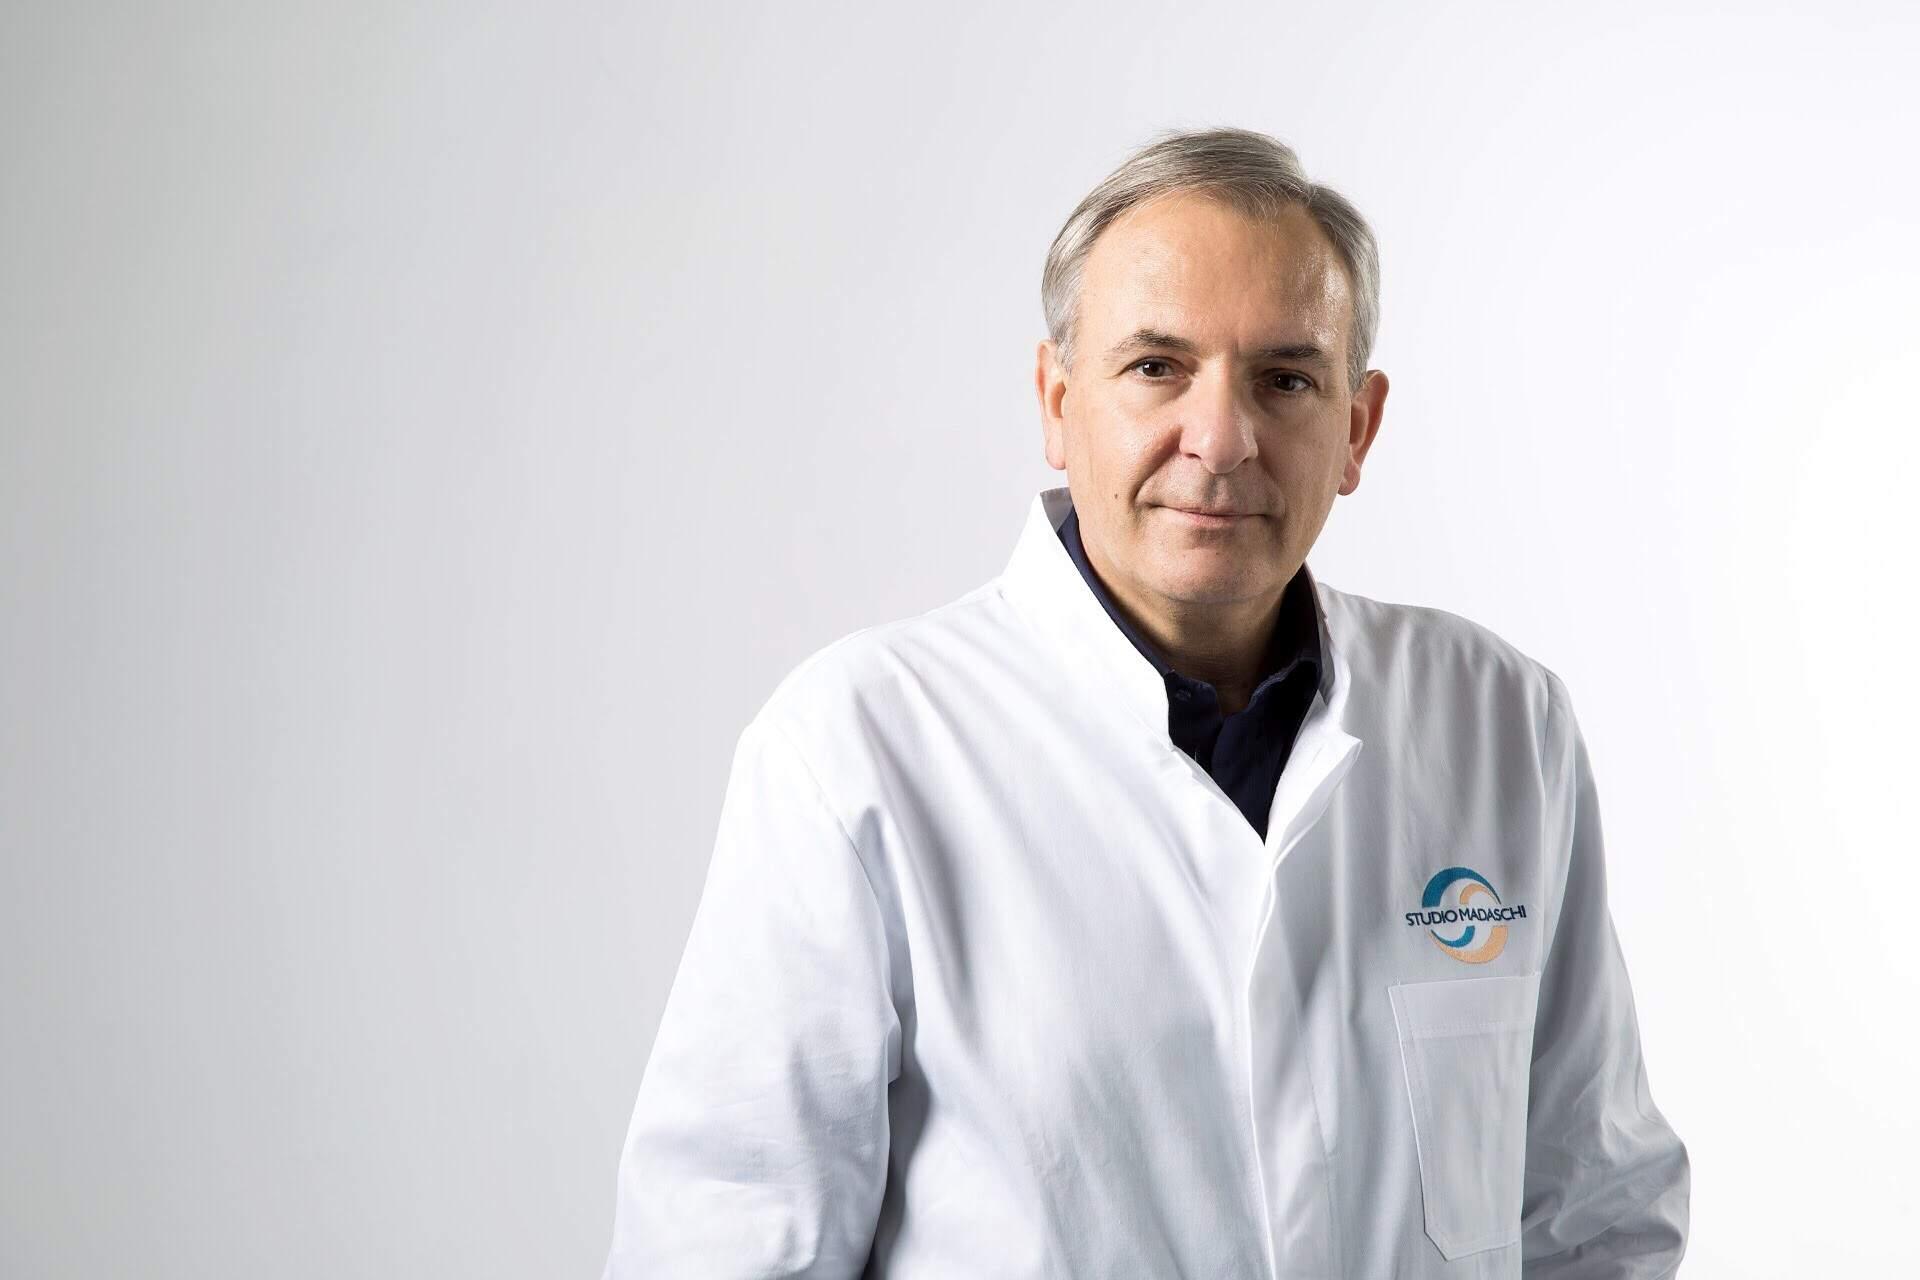 Dott. Fausto Madaschi